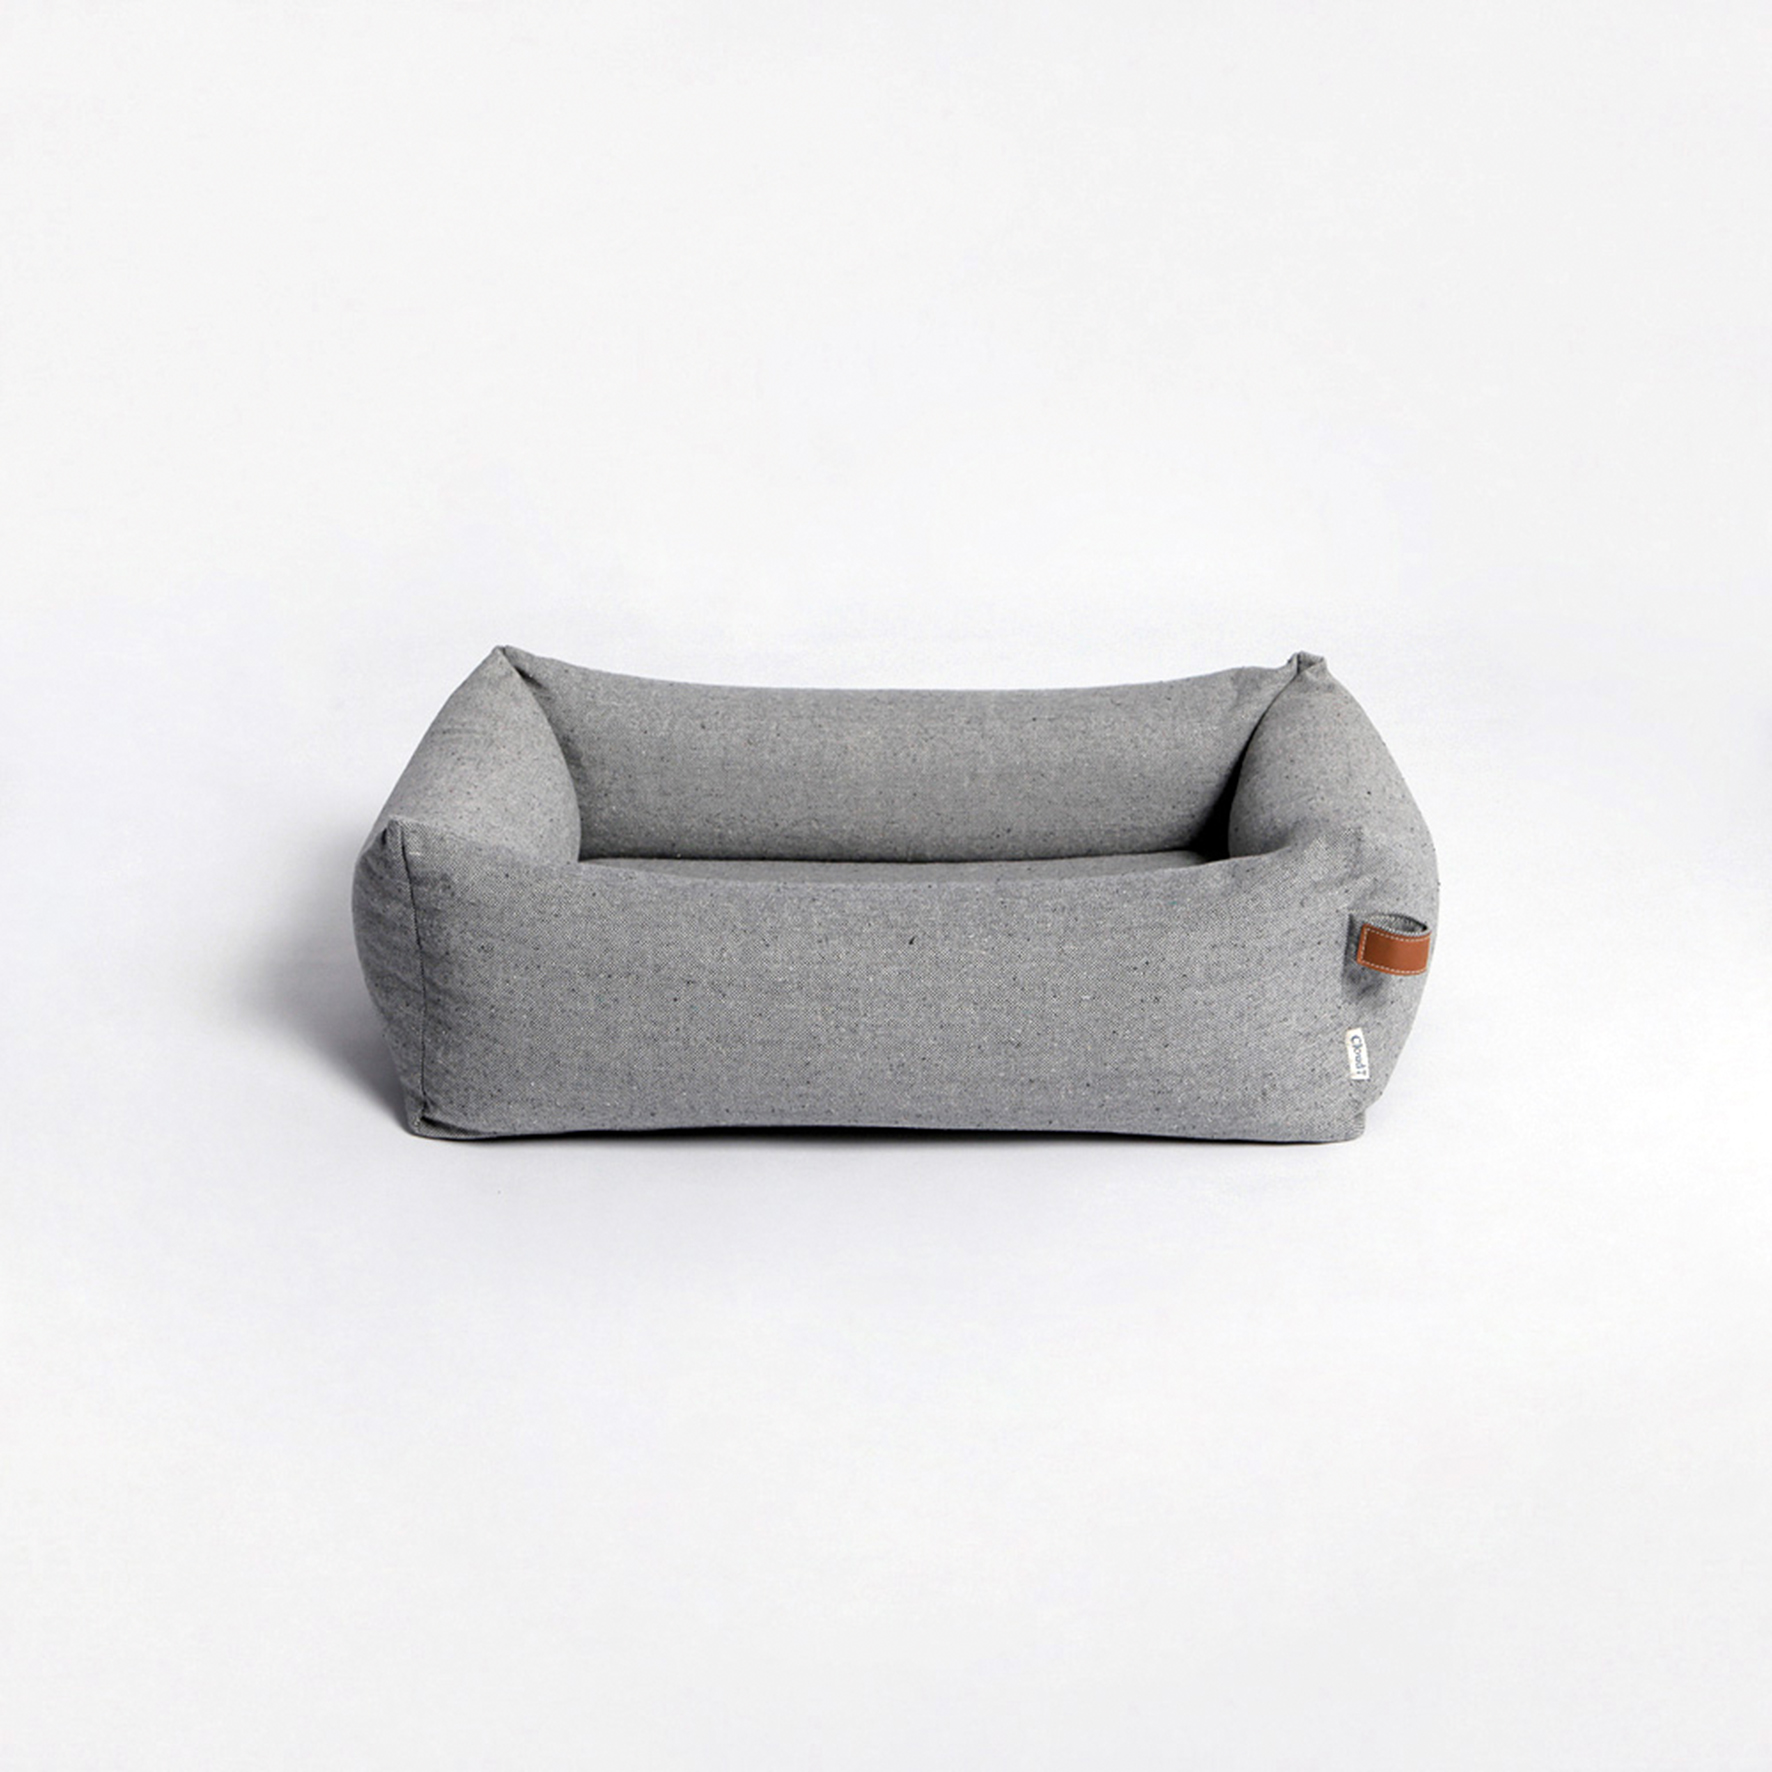 dog bed sleepy delux tweed grey -